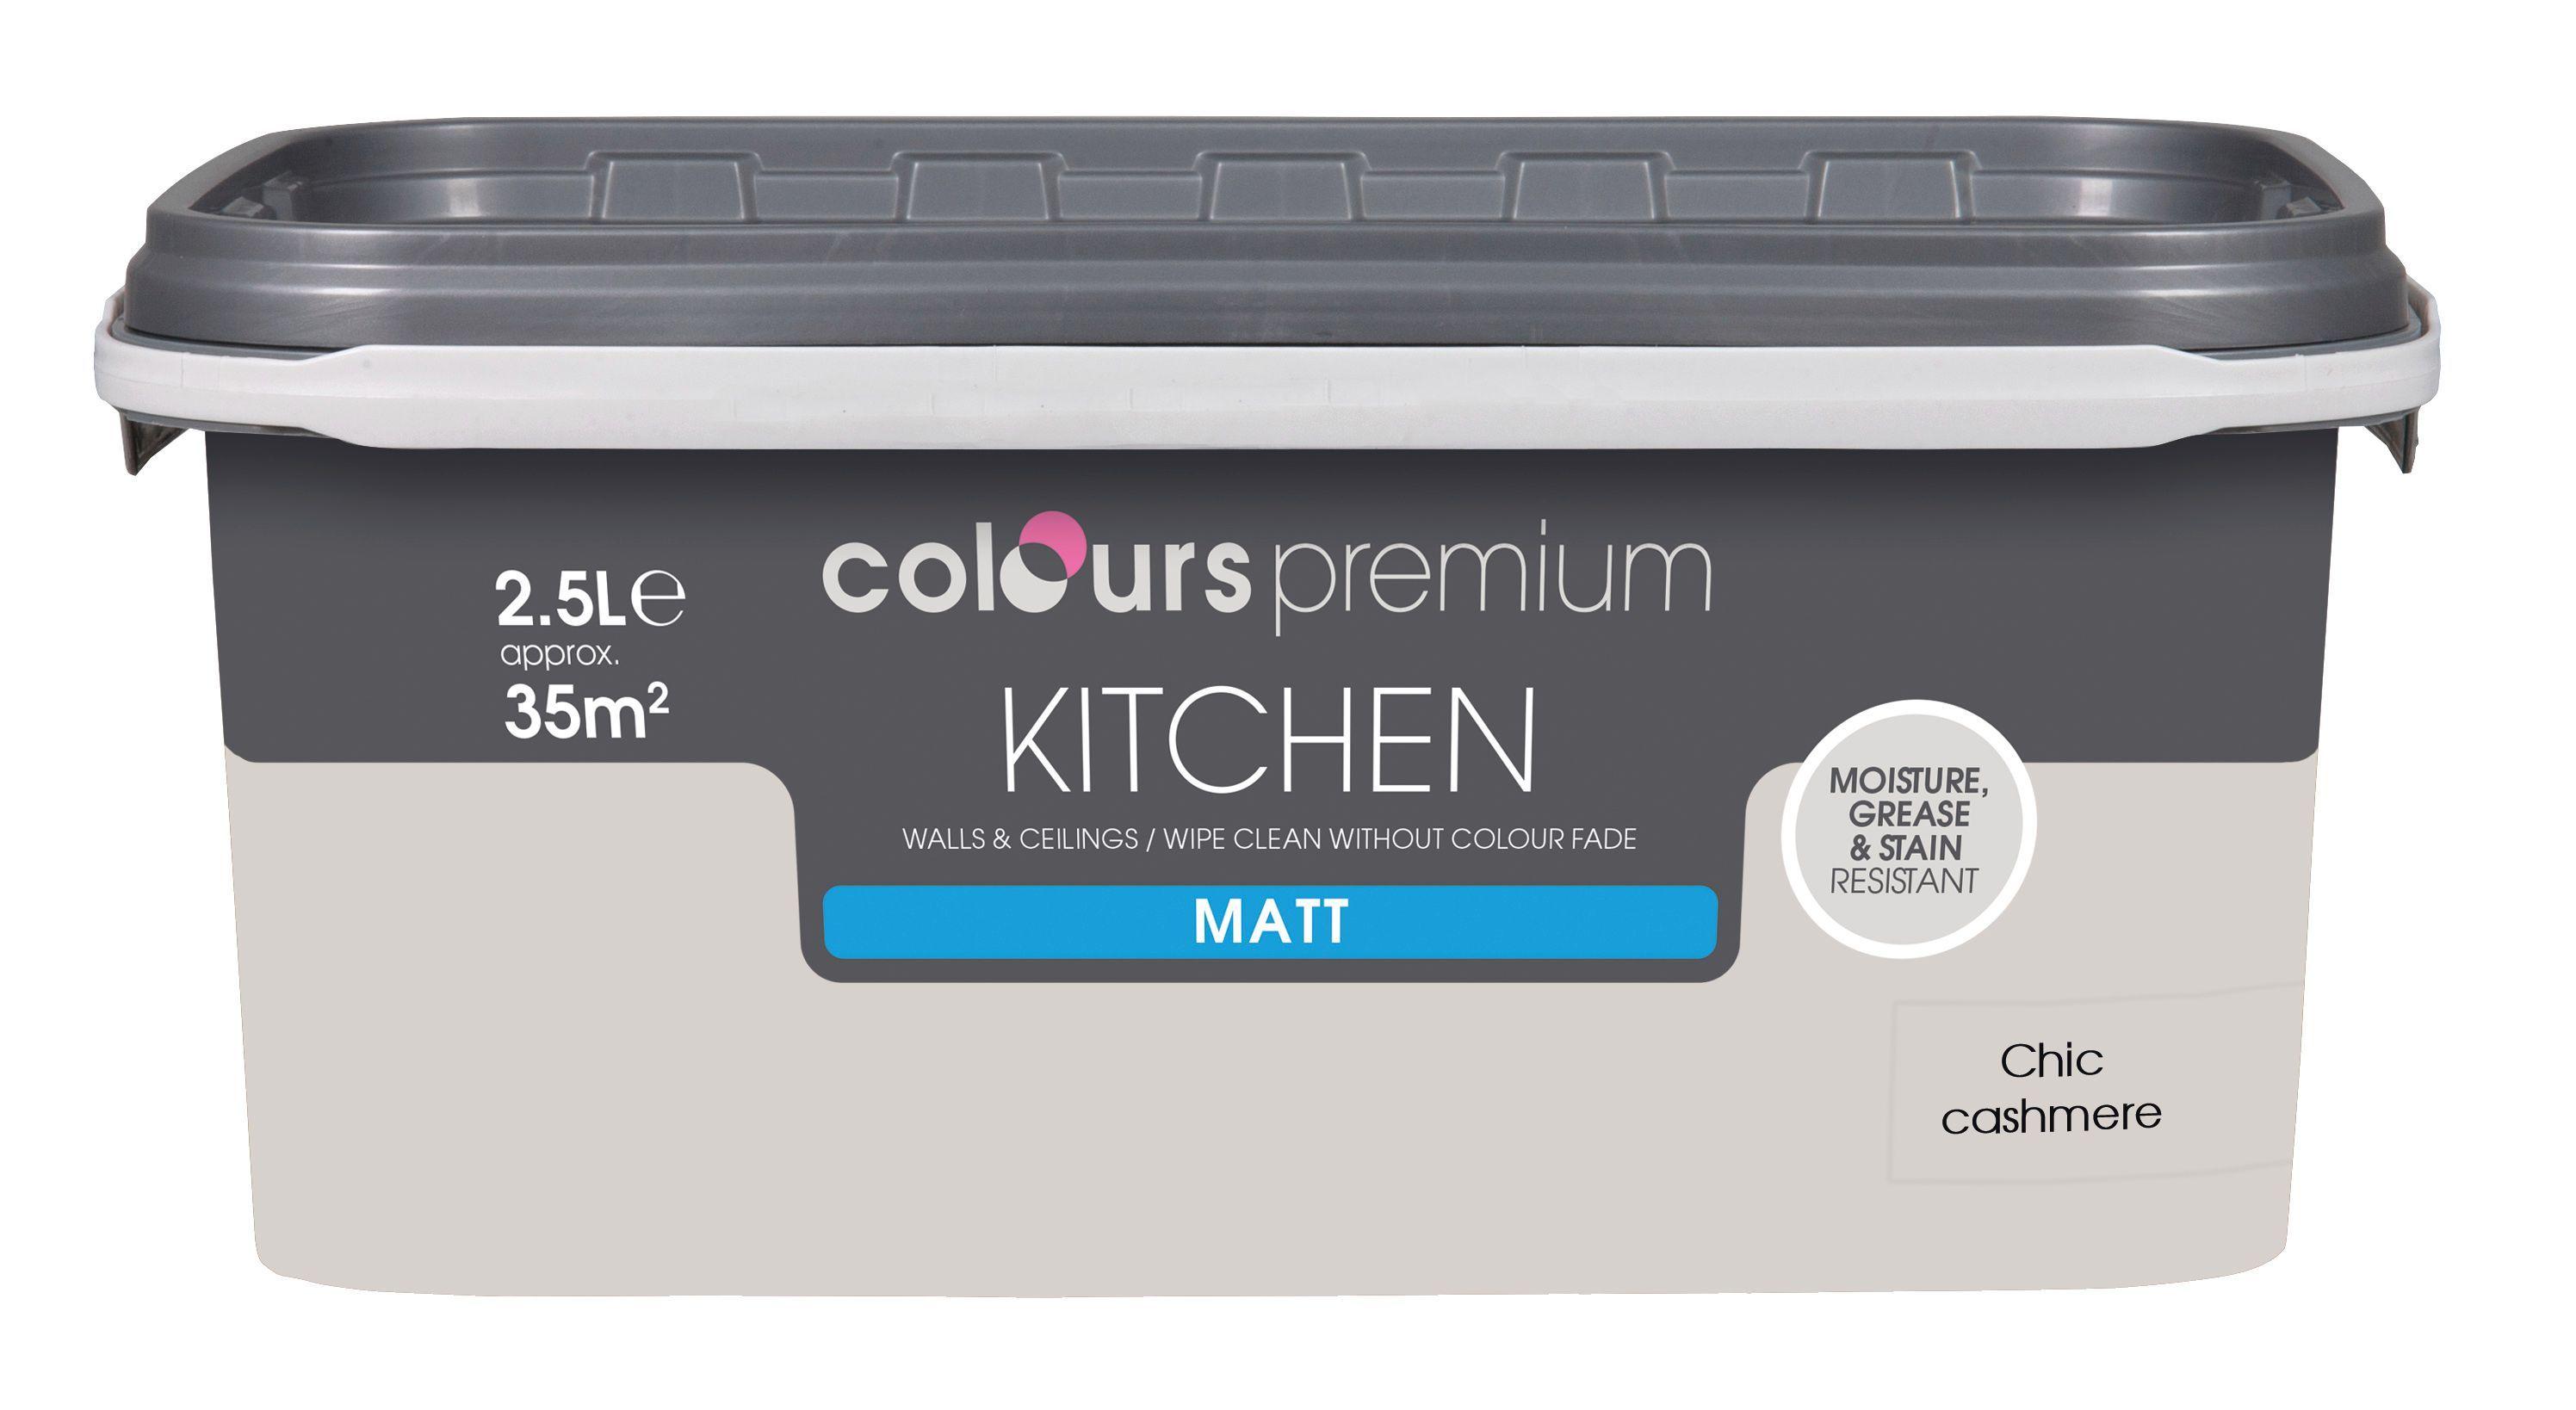 Enjoyable Colours Kitchen Chic Cashmere Matt Emulsion Paint 2 5L Home Interior And Landscaping Spoatsignezvosmurscom